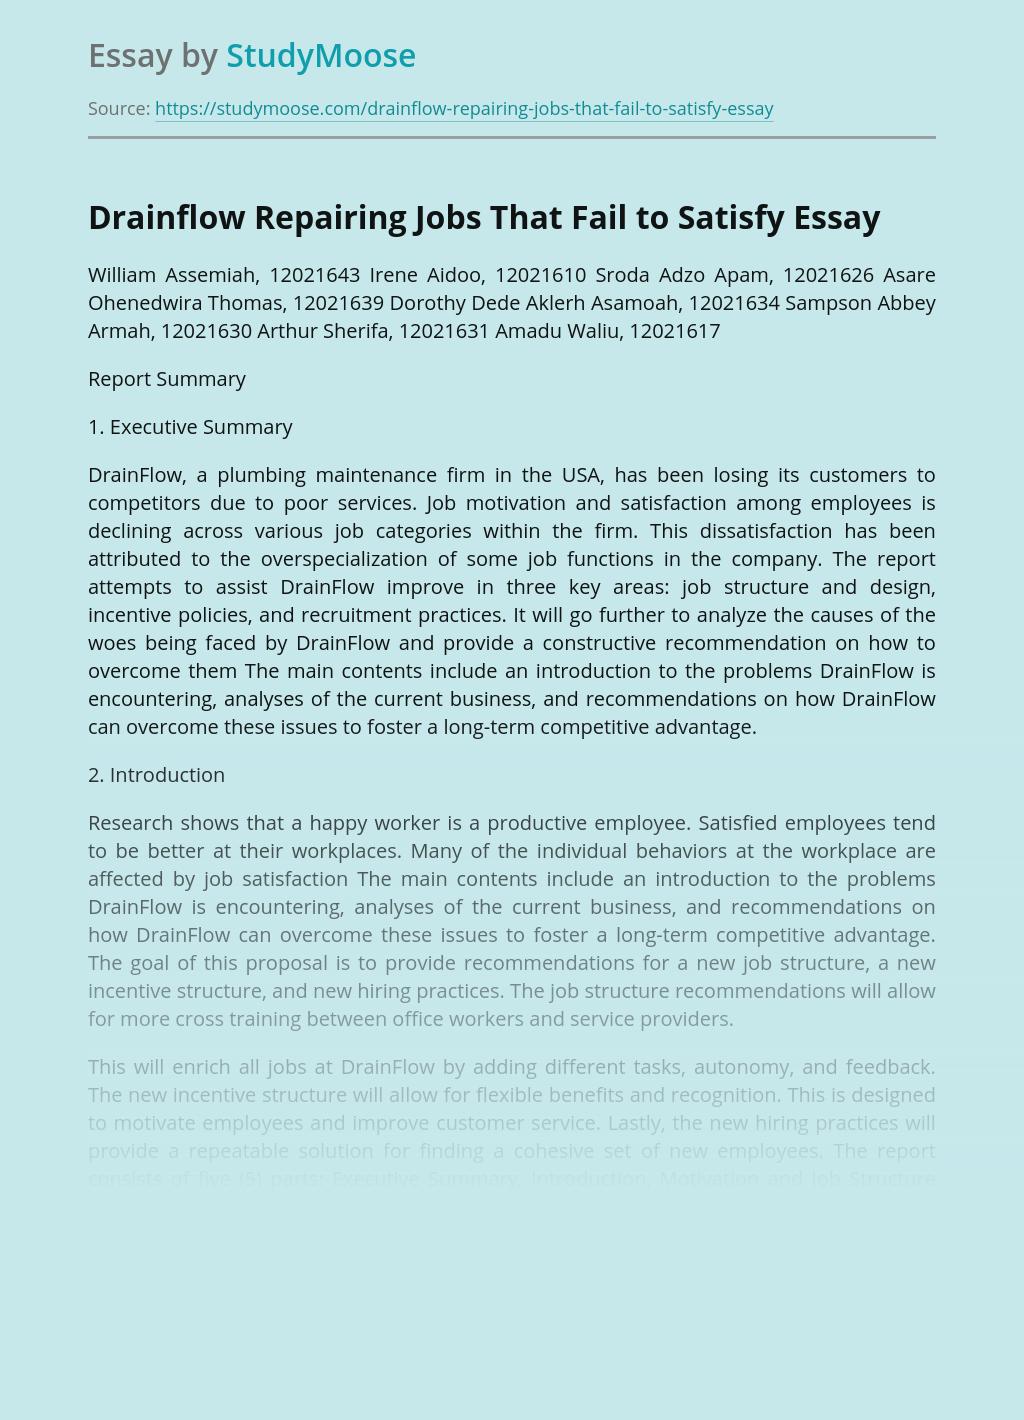 Drainflow Repairing Jobs That Fail to Satisfy